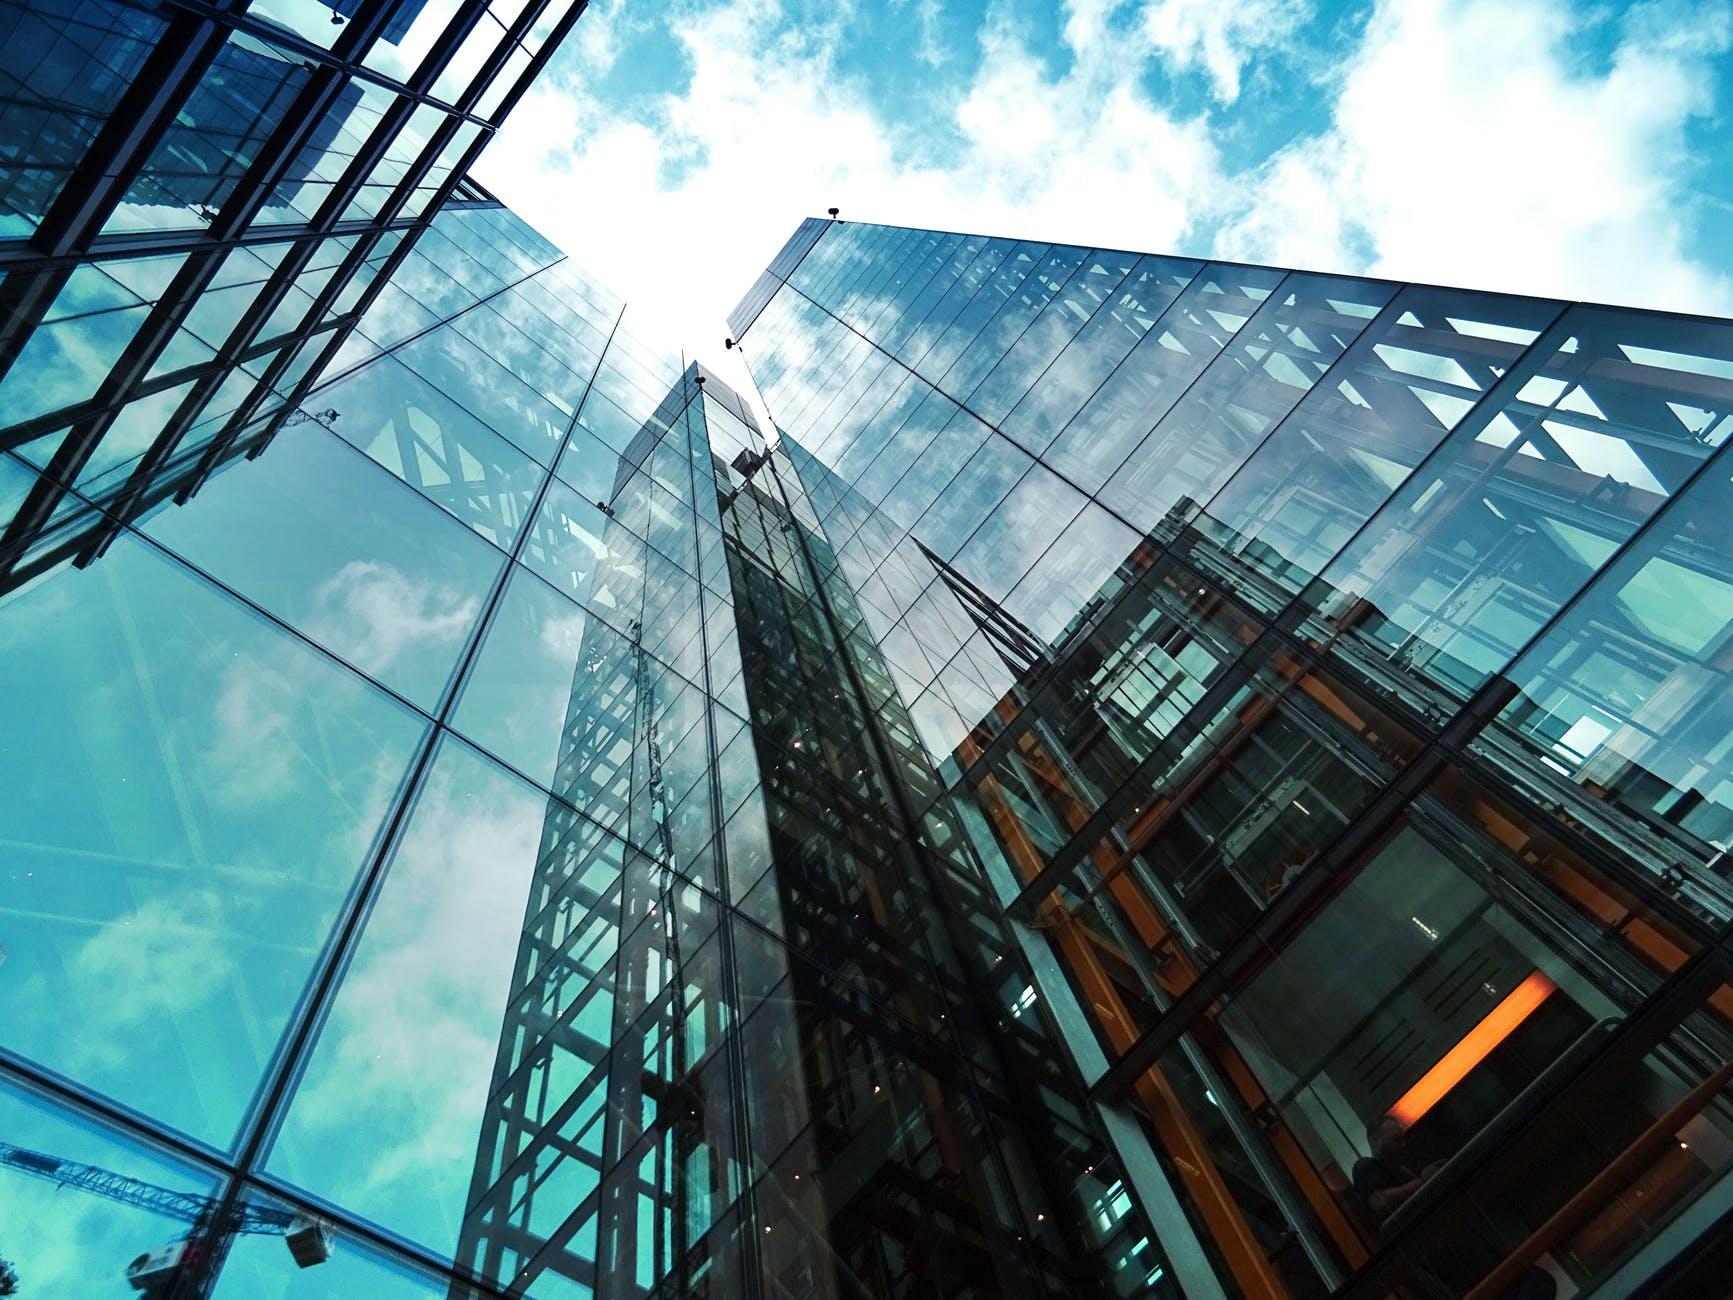 architectural design architecture building business